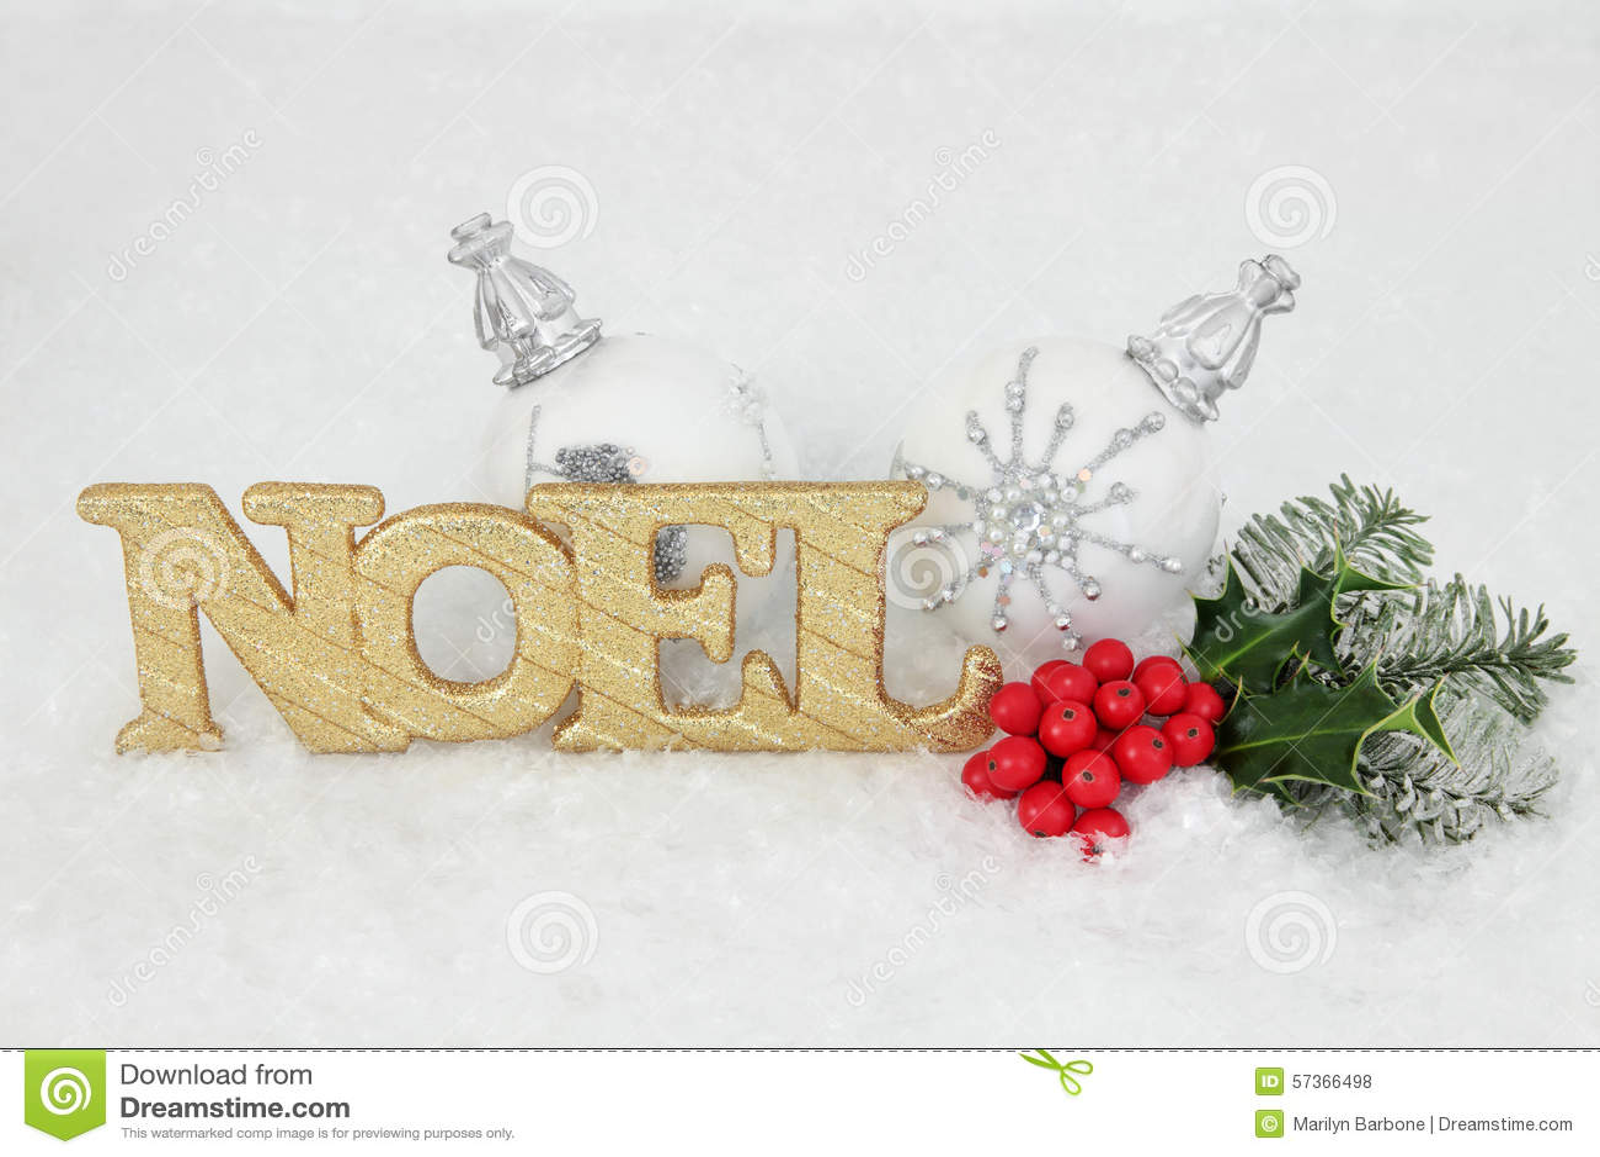 #B21923 Noel Decoration Stock Photo Image: 57366498 6361 décoration noel commerce 1300x957 px @ aertt.com